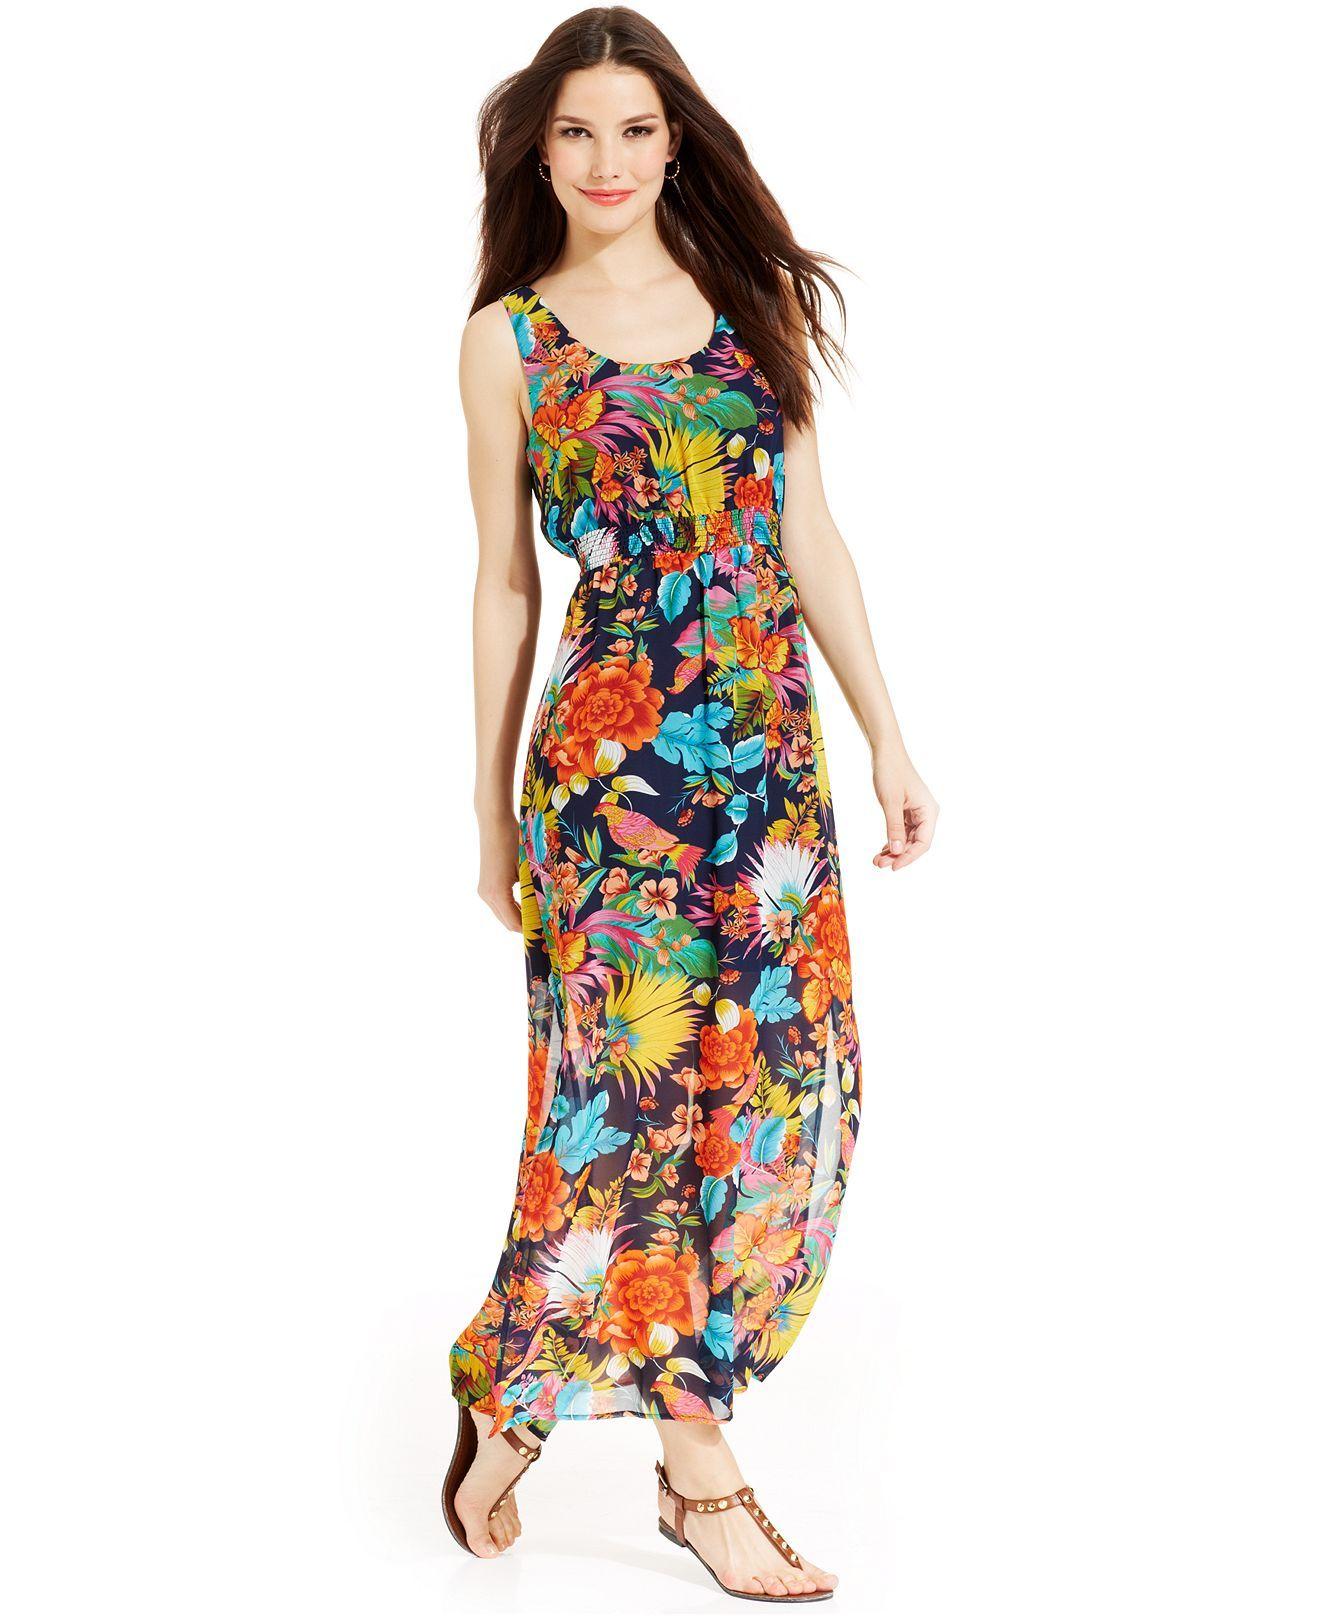 1905c5162a2 Spense Petite Sleeveless Floral-Print Empire-Waist Maxi Dress - Dresses -  Women -